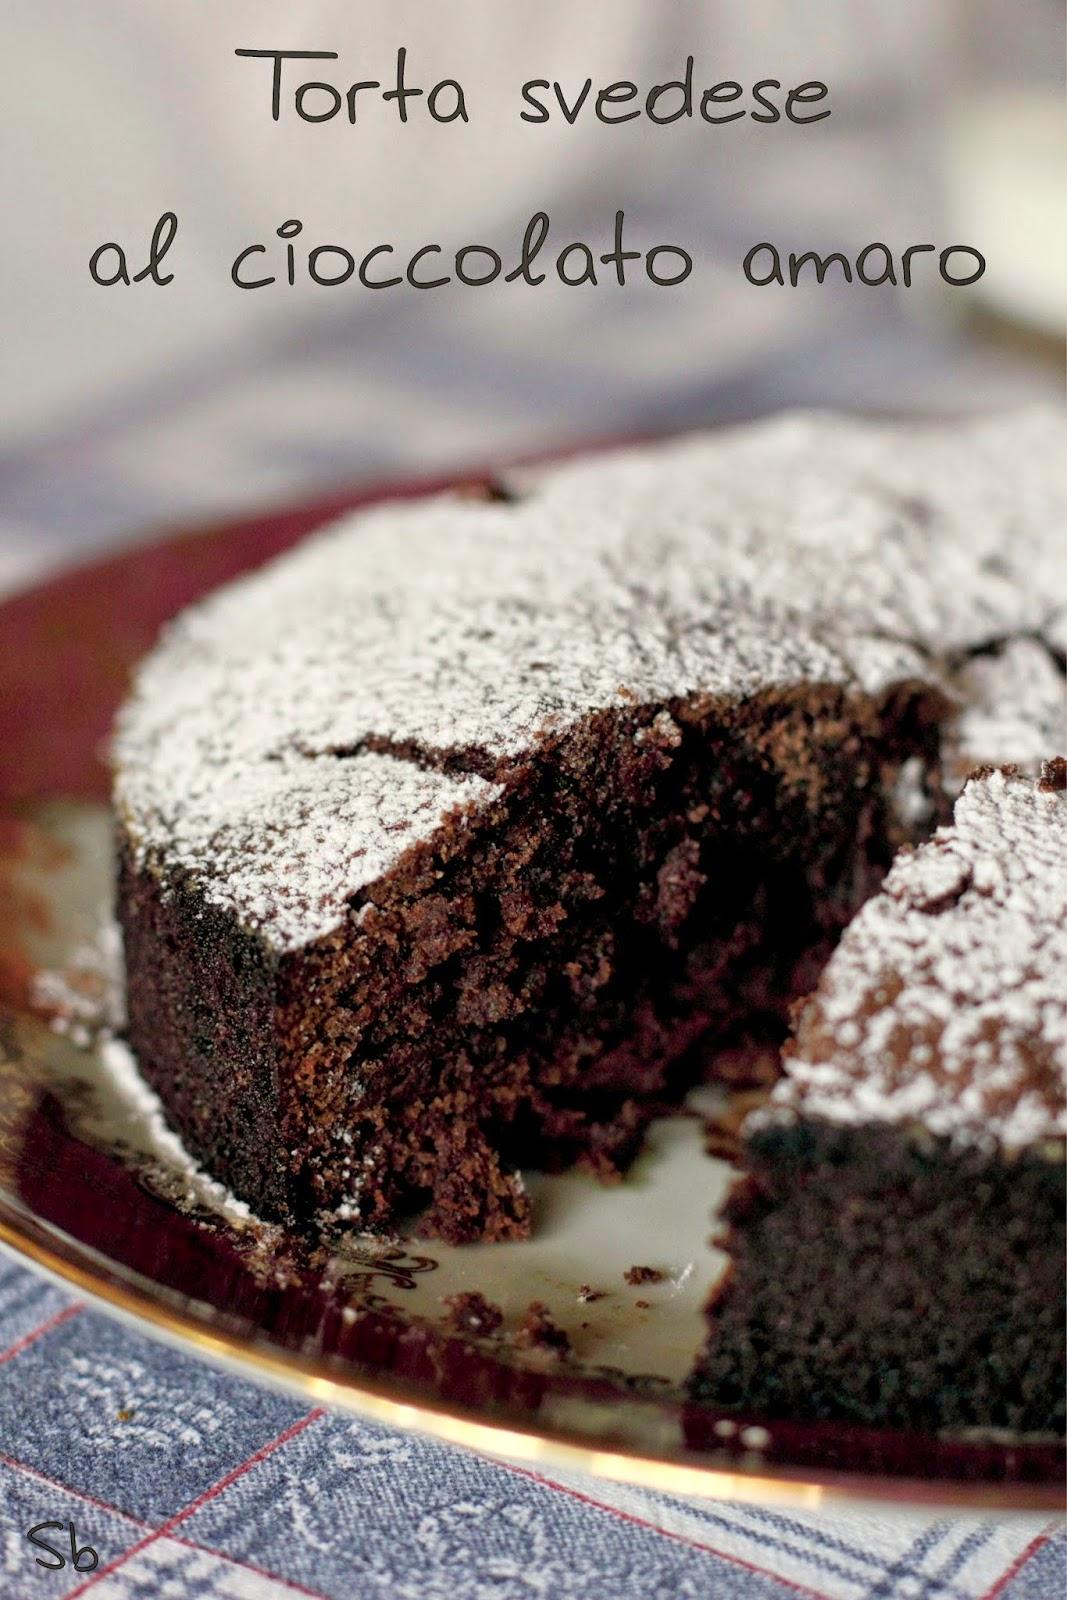 torta svedese al cacao amaro